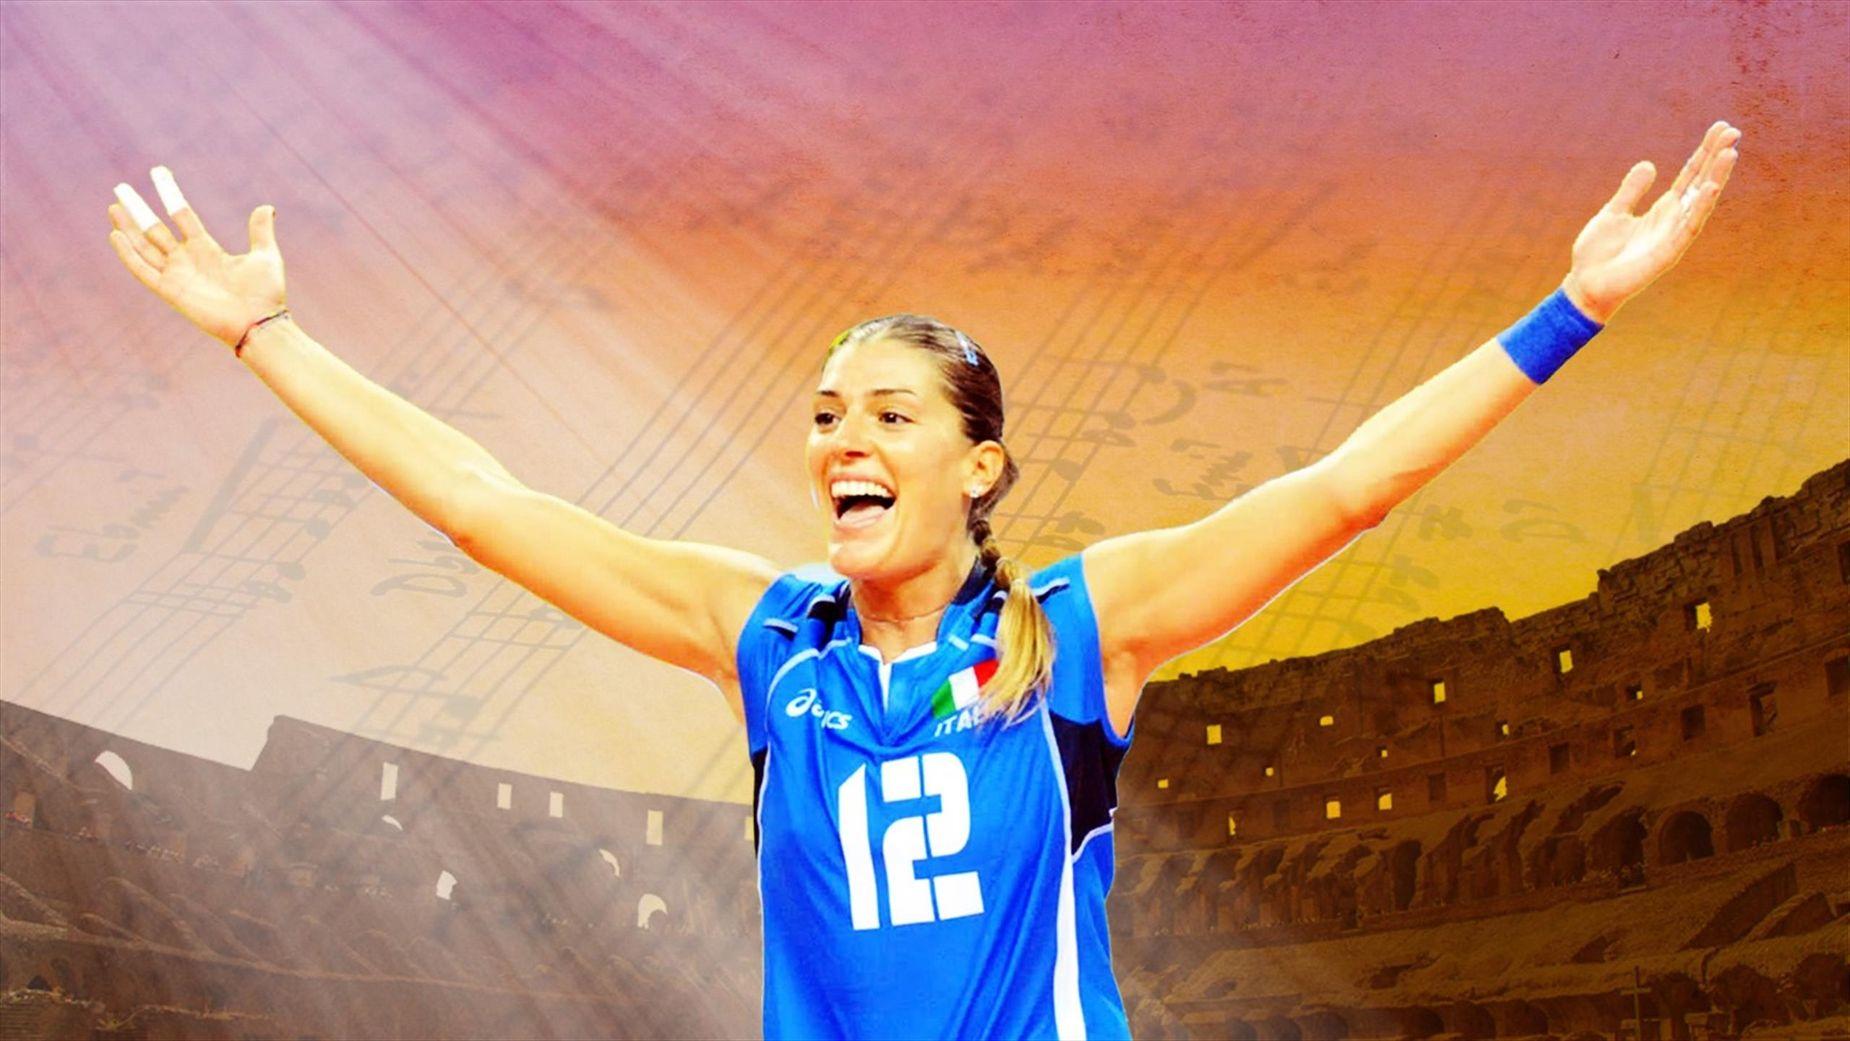 Francesca Piccinini Calendario.Francesca Piccinini La 7a Sinfonia Della Regina Del Volley